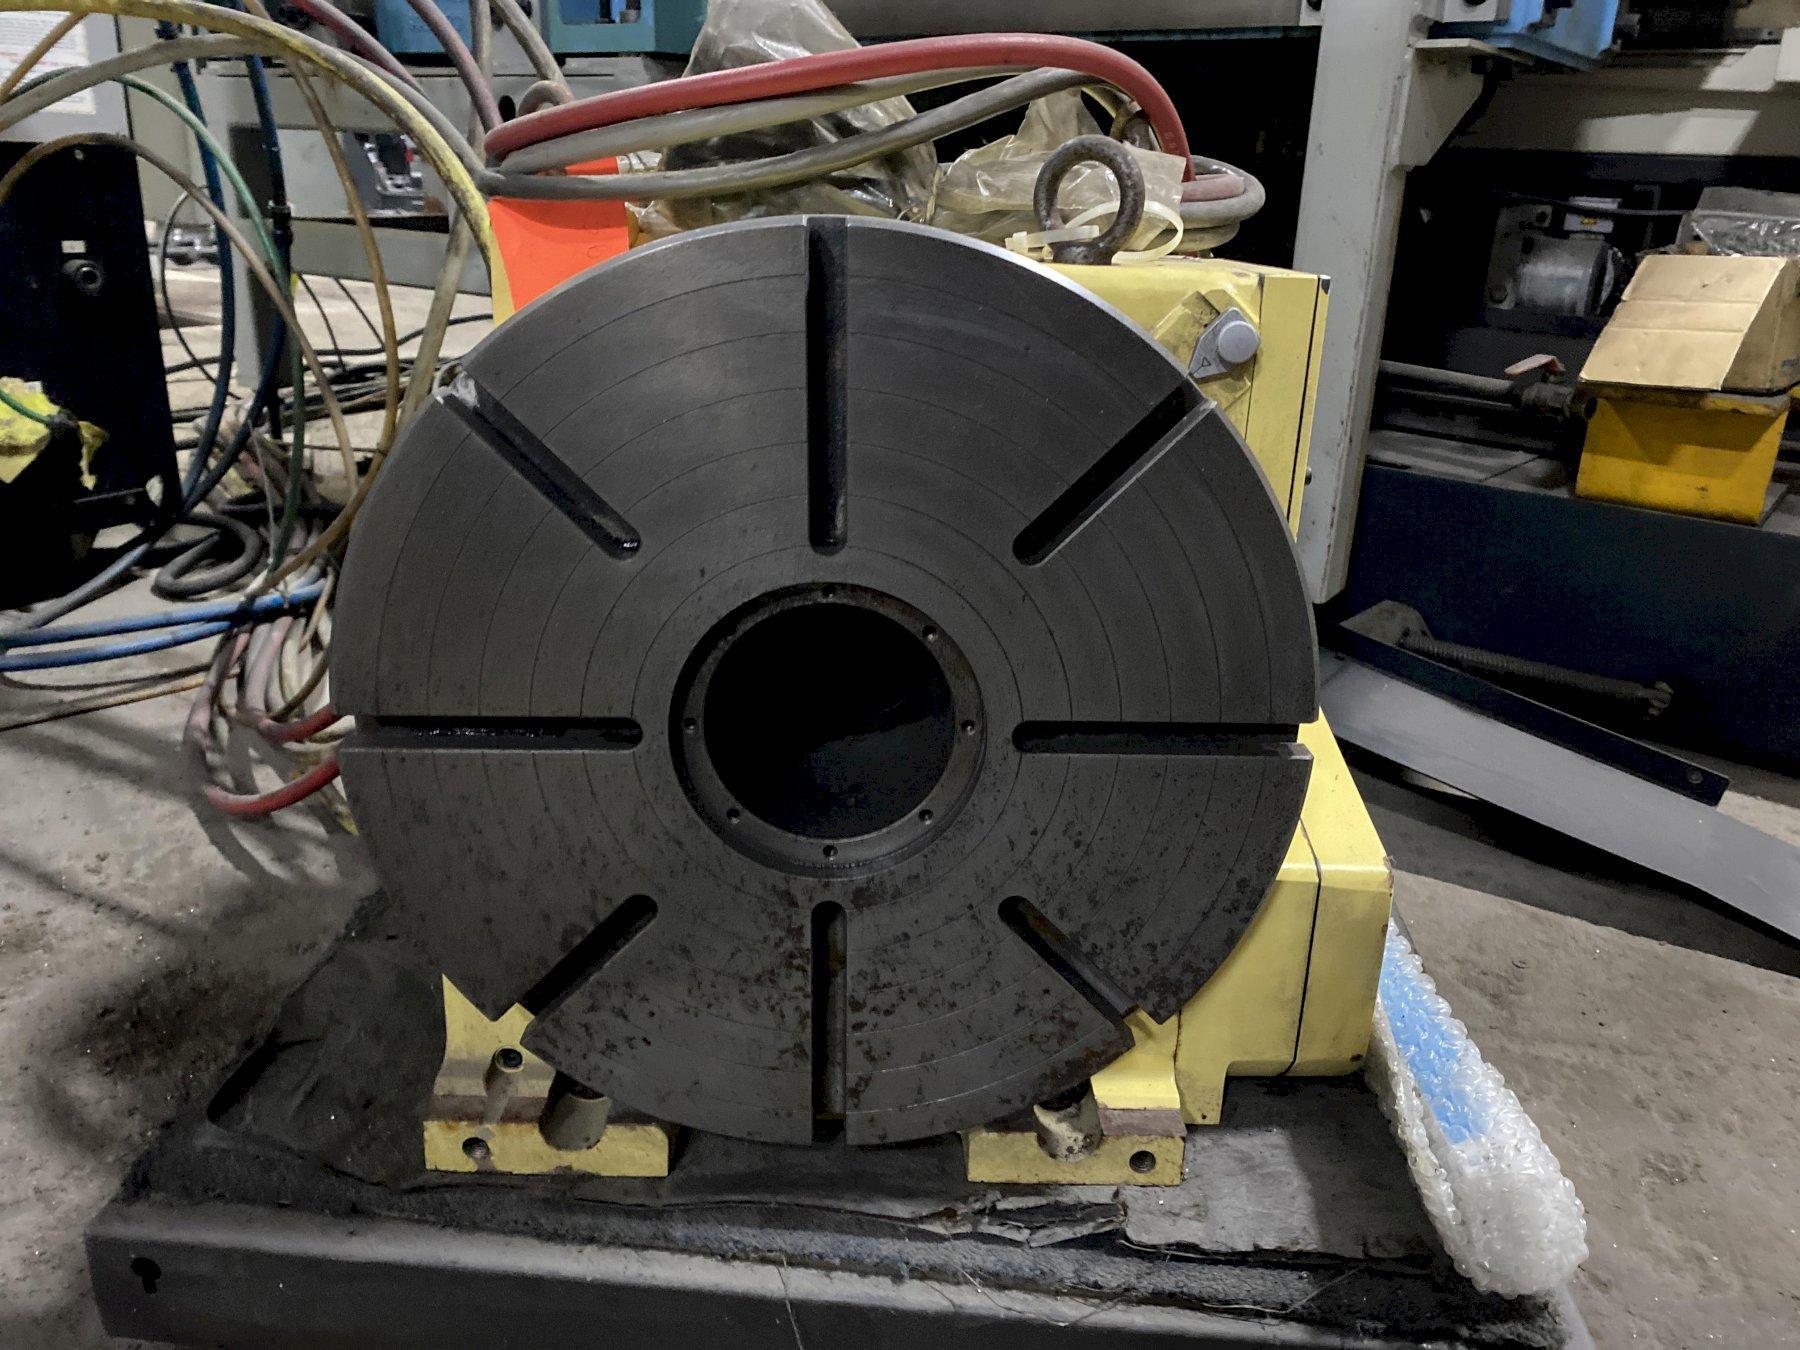 2002 MAKINO V77 w/4th Axis - Vertical Machining Center